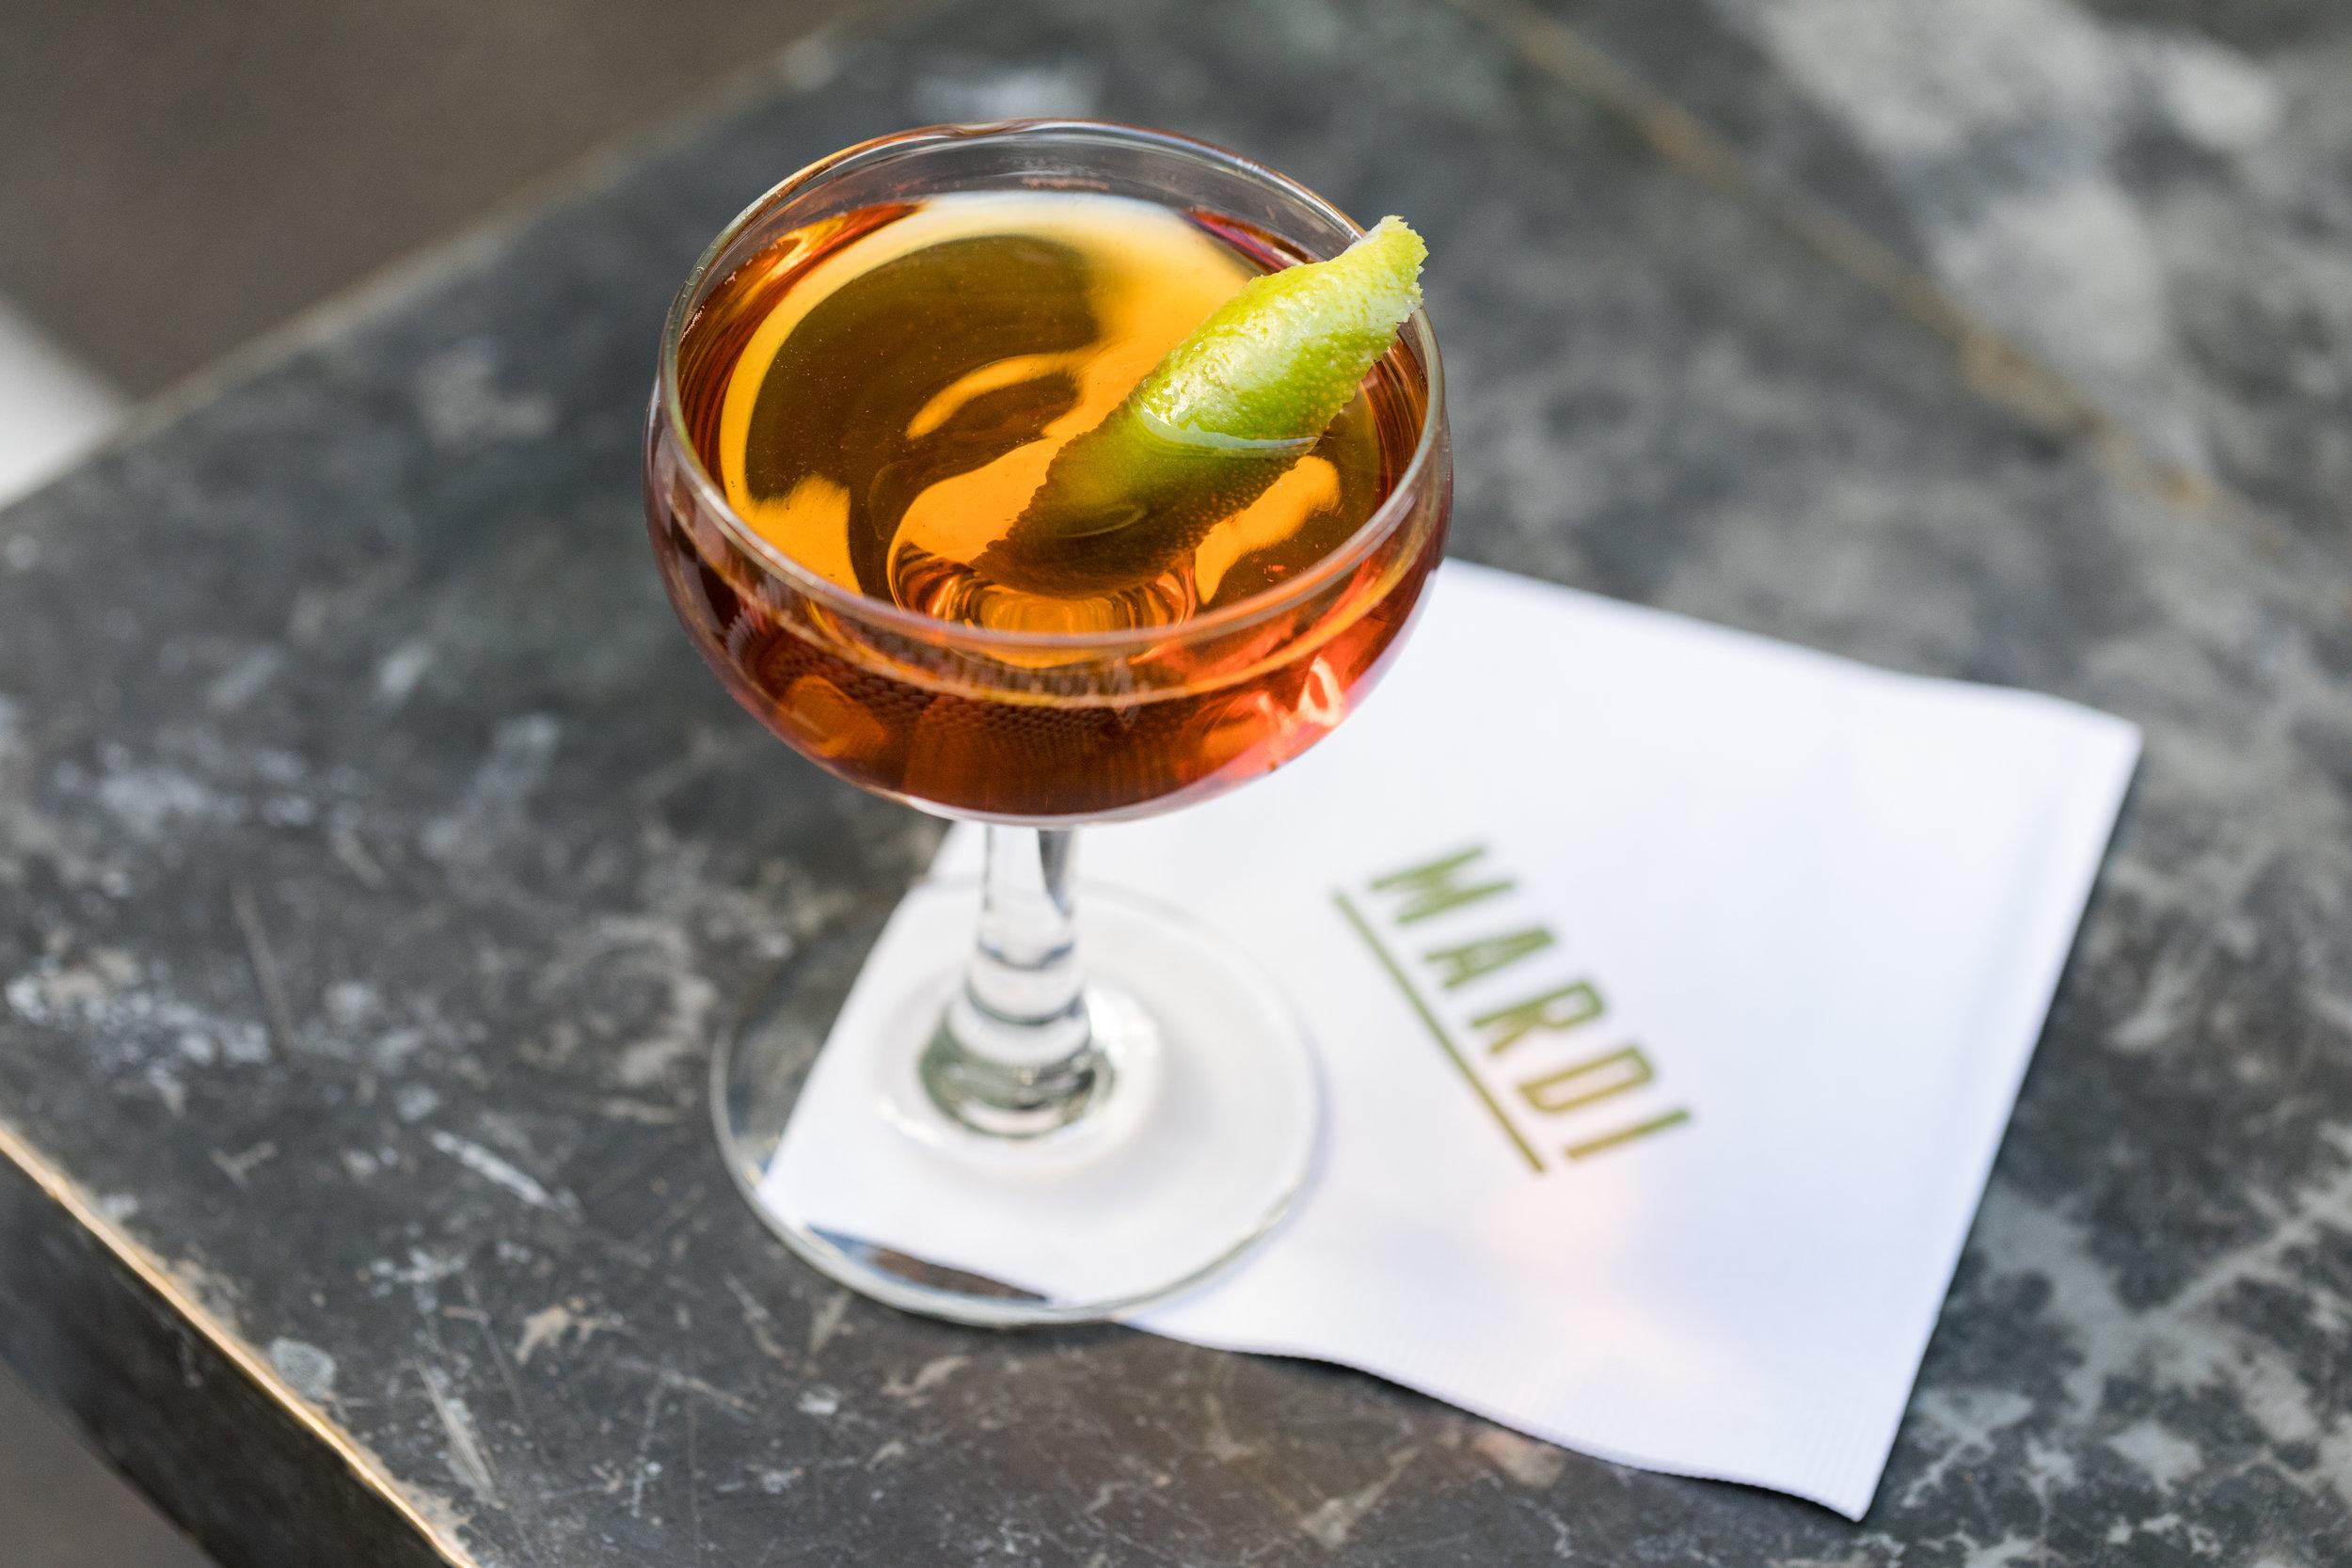 Orange cocktail with lime garnish on Mardi branded napkin, all on corner of grey metal table.